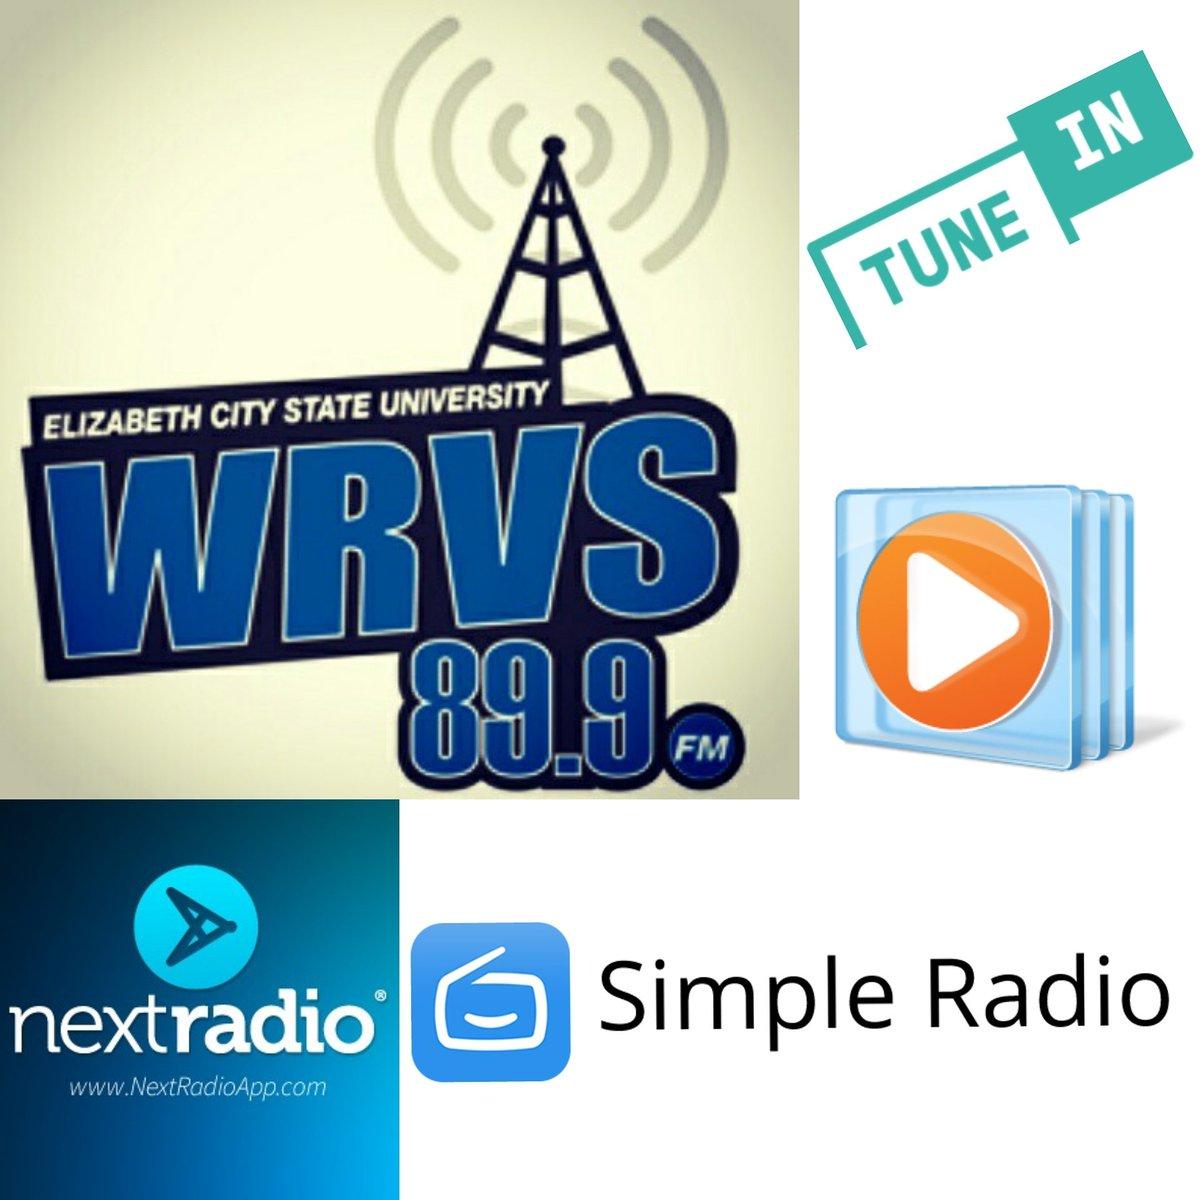 WRVS-FM 89 9 on Twitter: